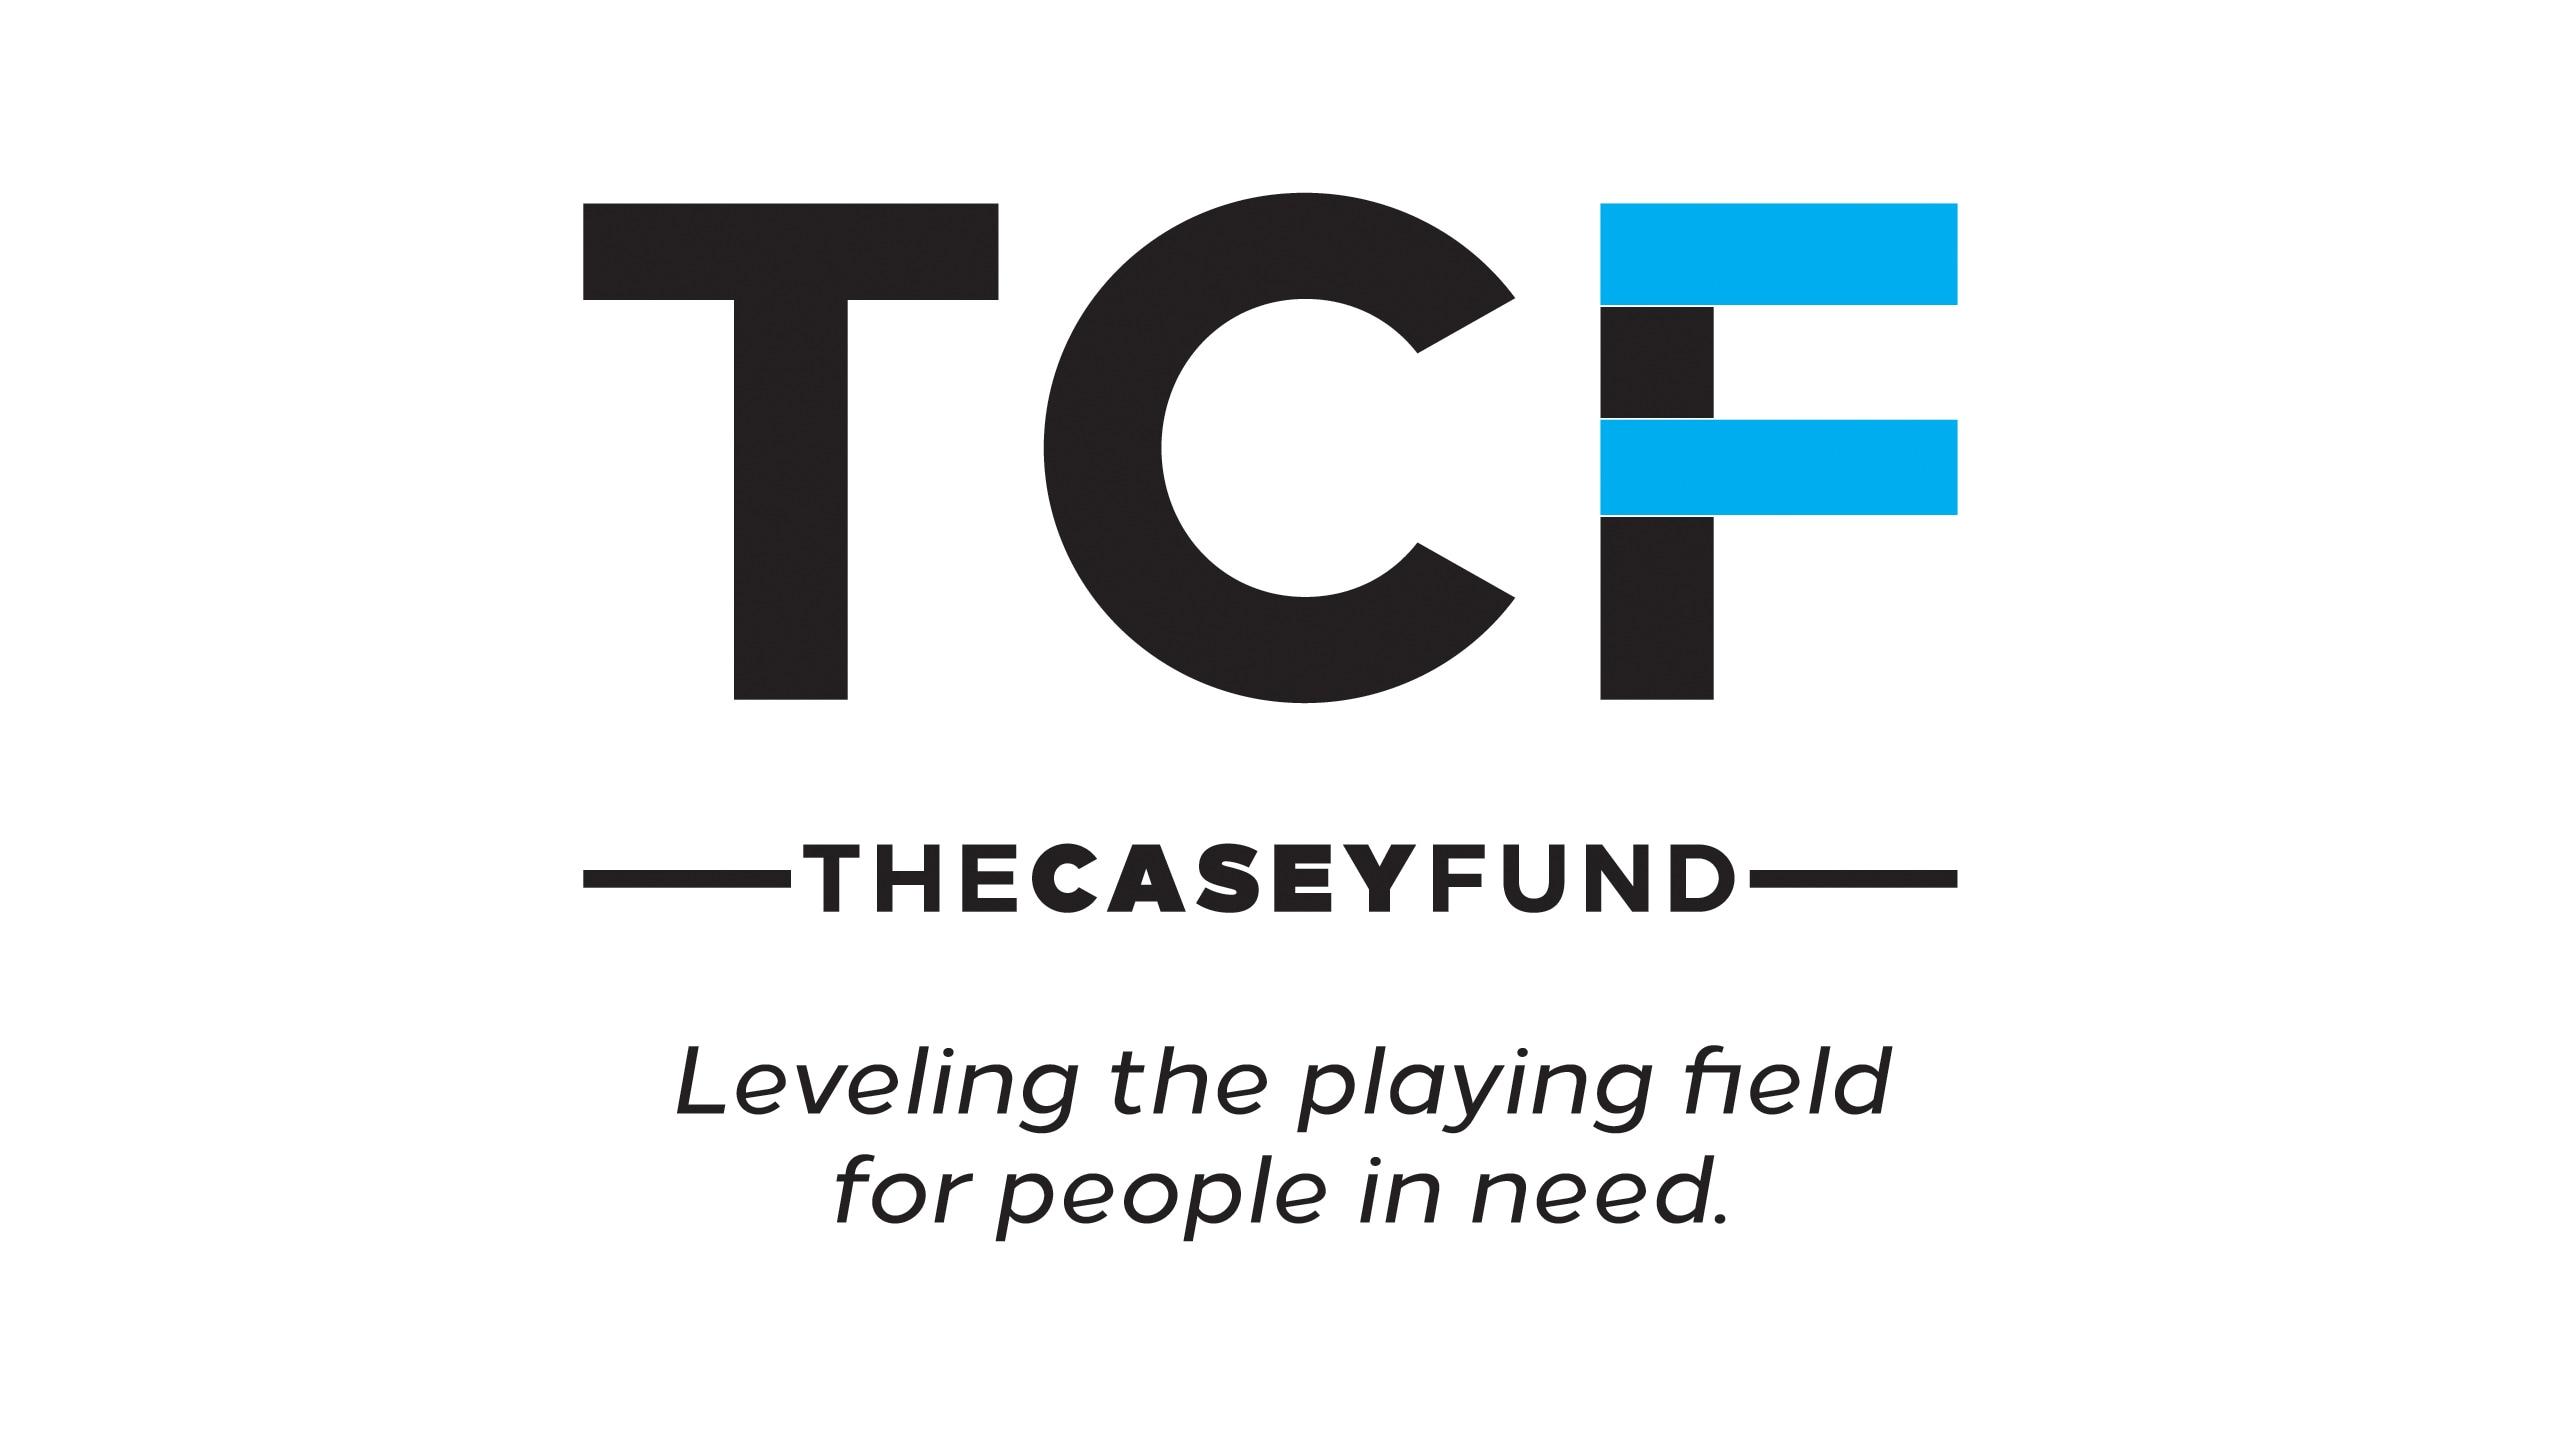 Jurrell Casey - The Casey Fund